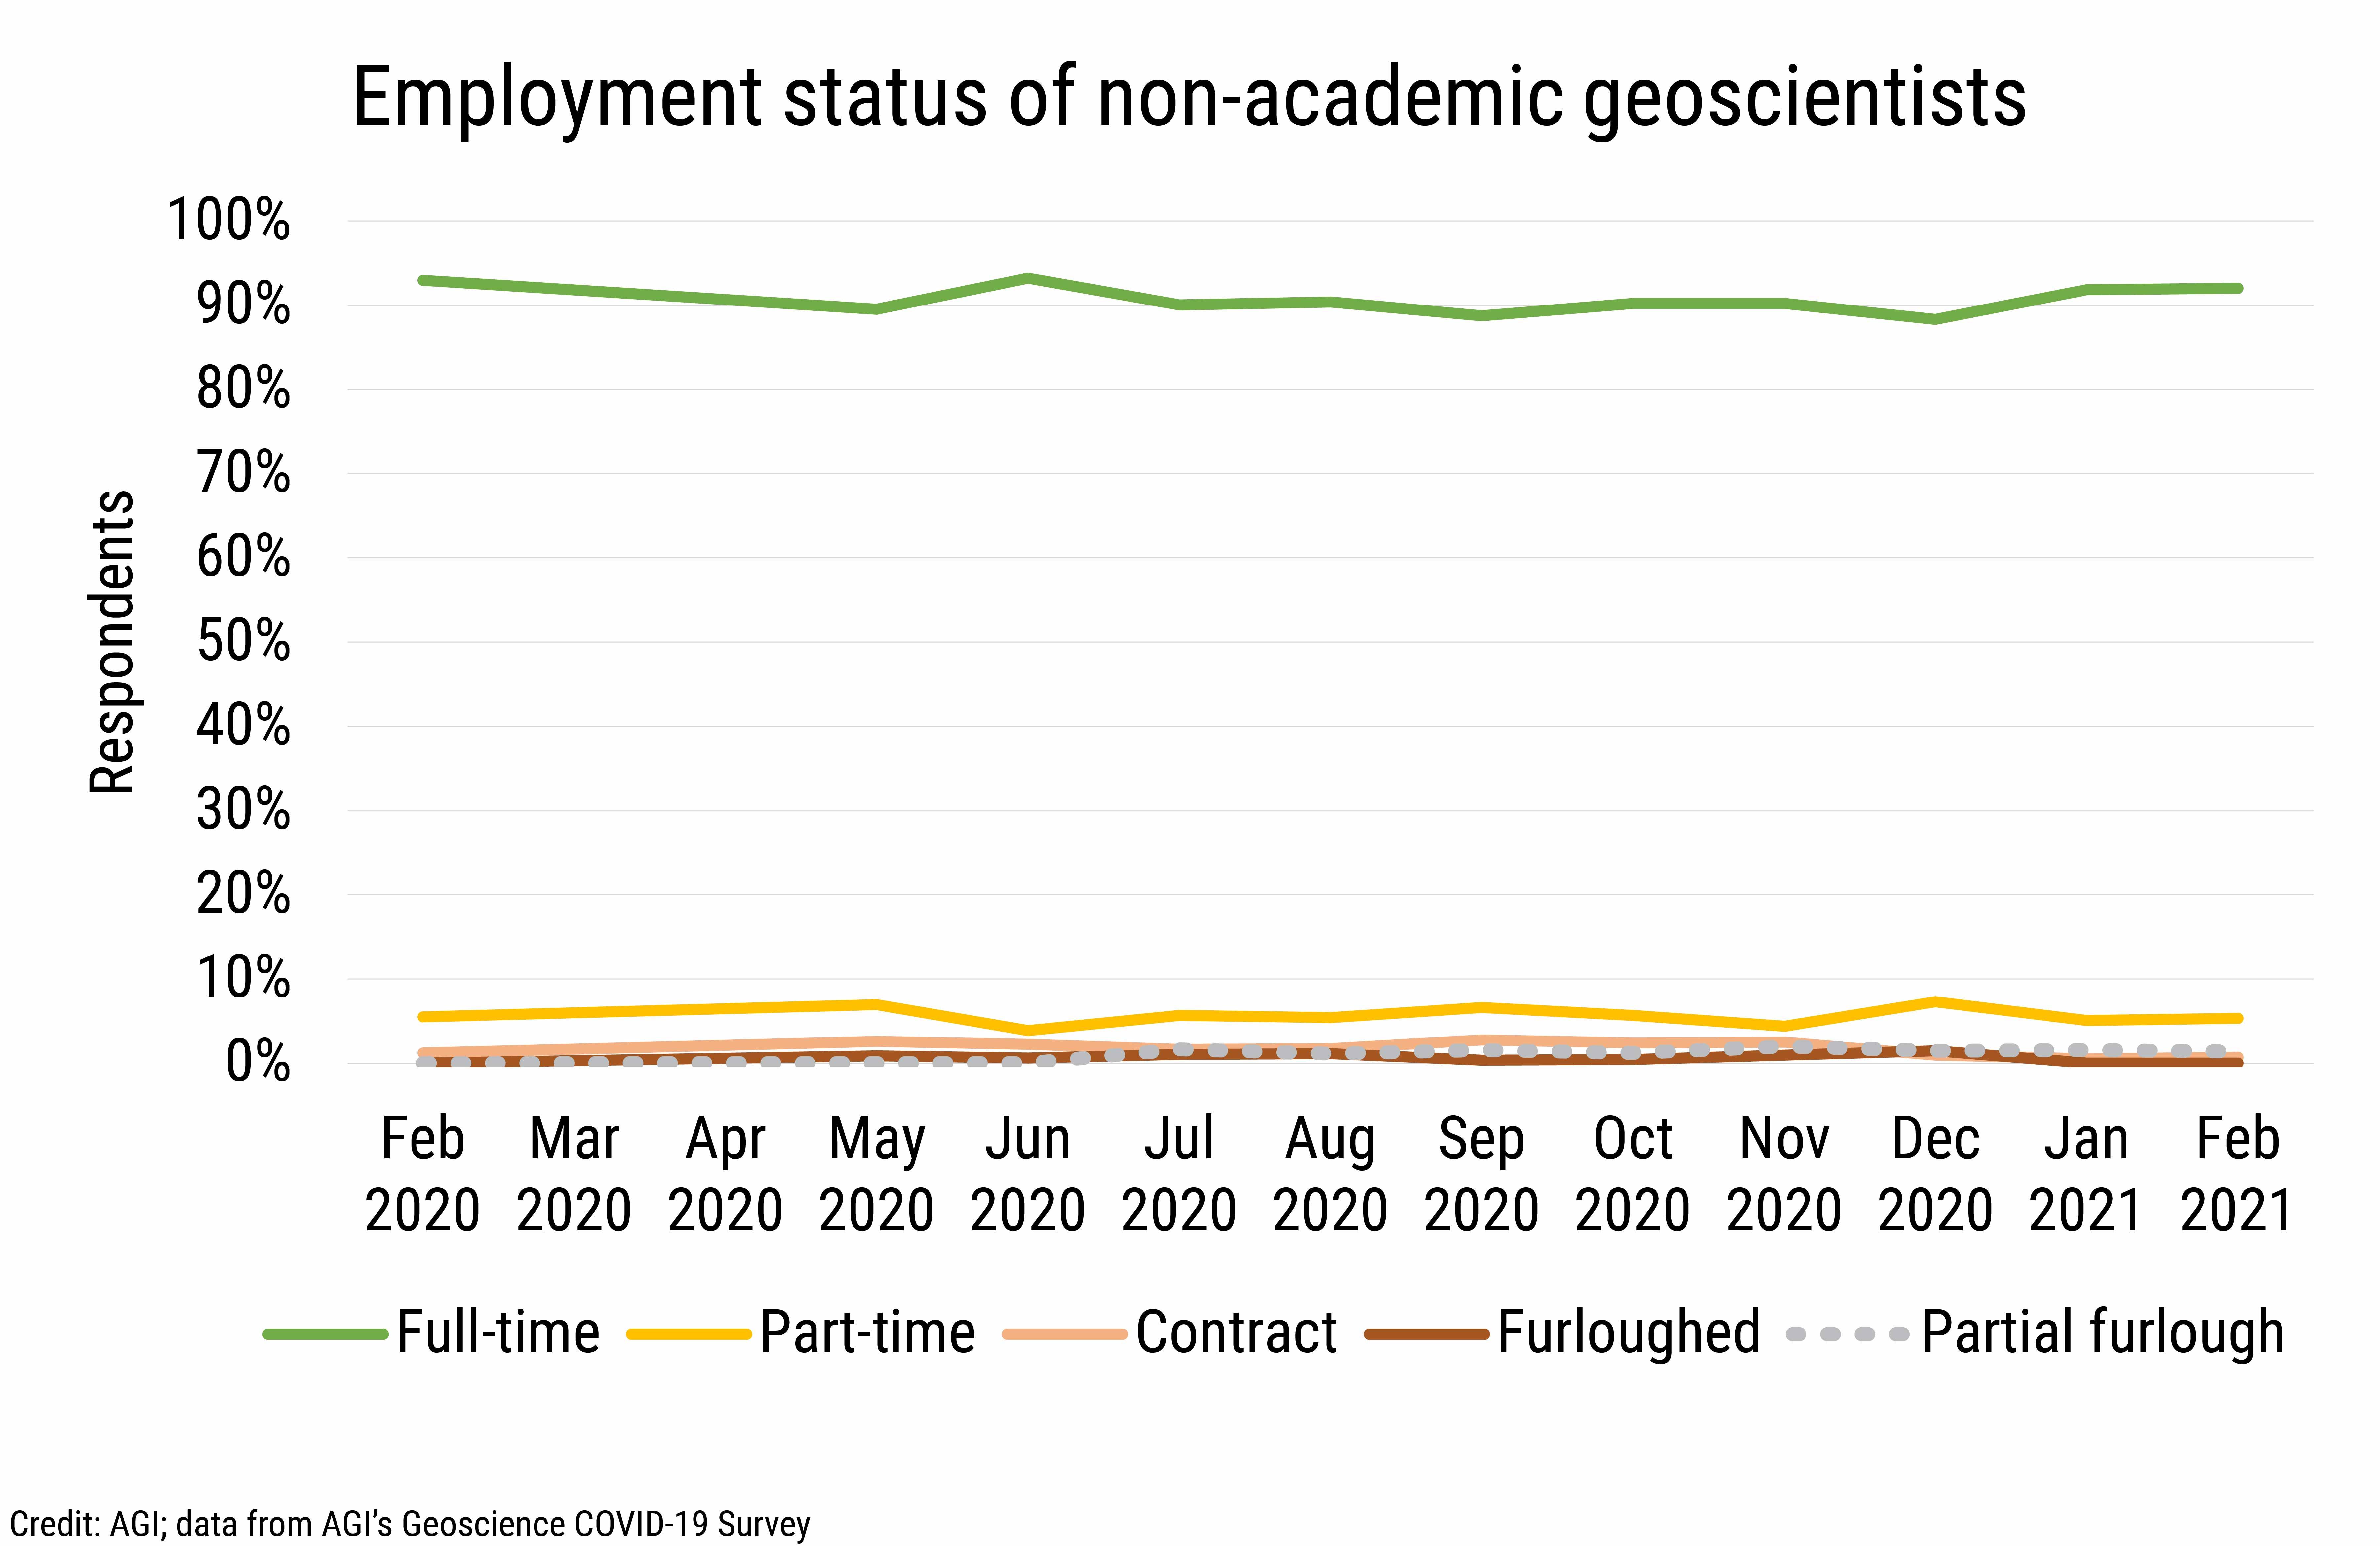 DB_2021-006 chart 02: Employment status of non-academic geoscientists (Credit: AGI; data from AGI's Geoscience COVID-19 Survey)